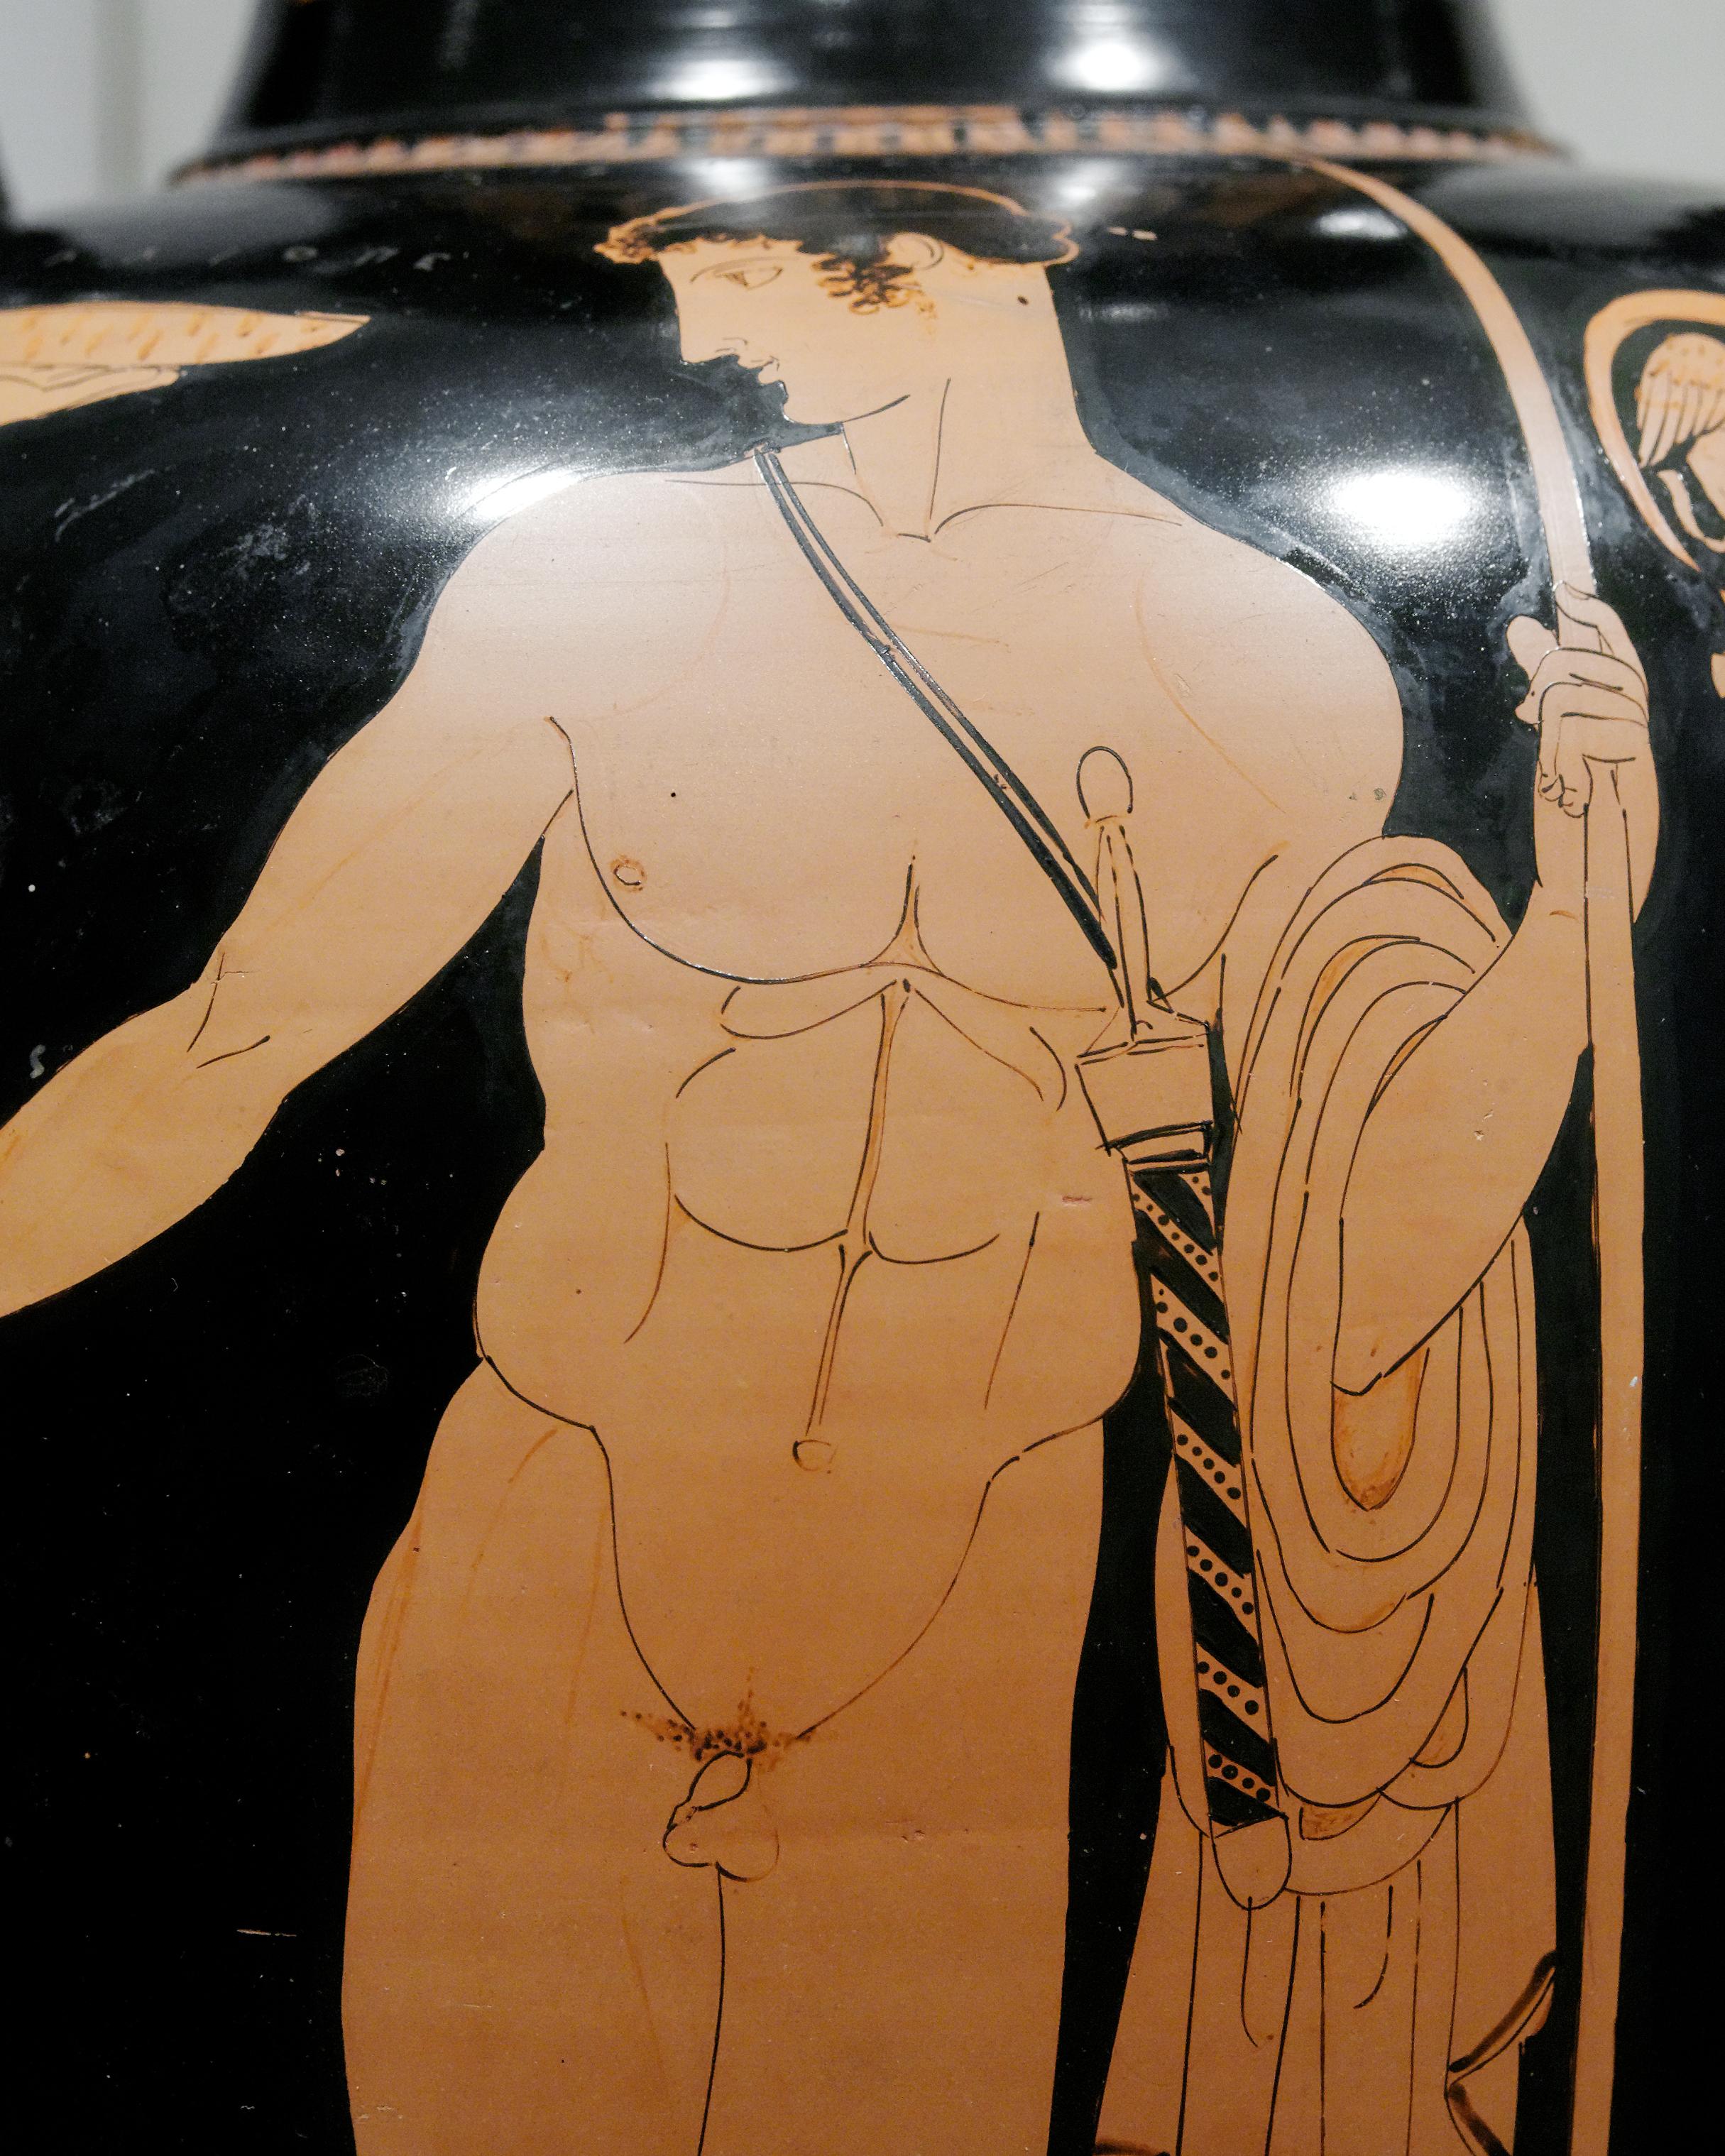 https://i0.wp.com/upload.wikimedia.org/wikipedia/commons/6/61/Neoptolemos_departure_Met_06.1021.116_n02.jpg